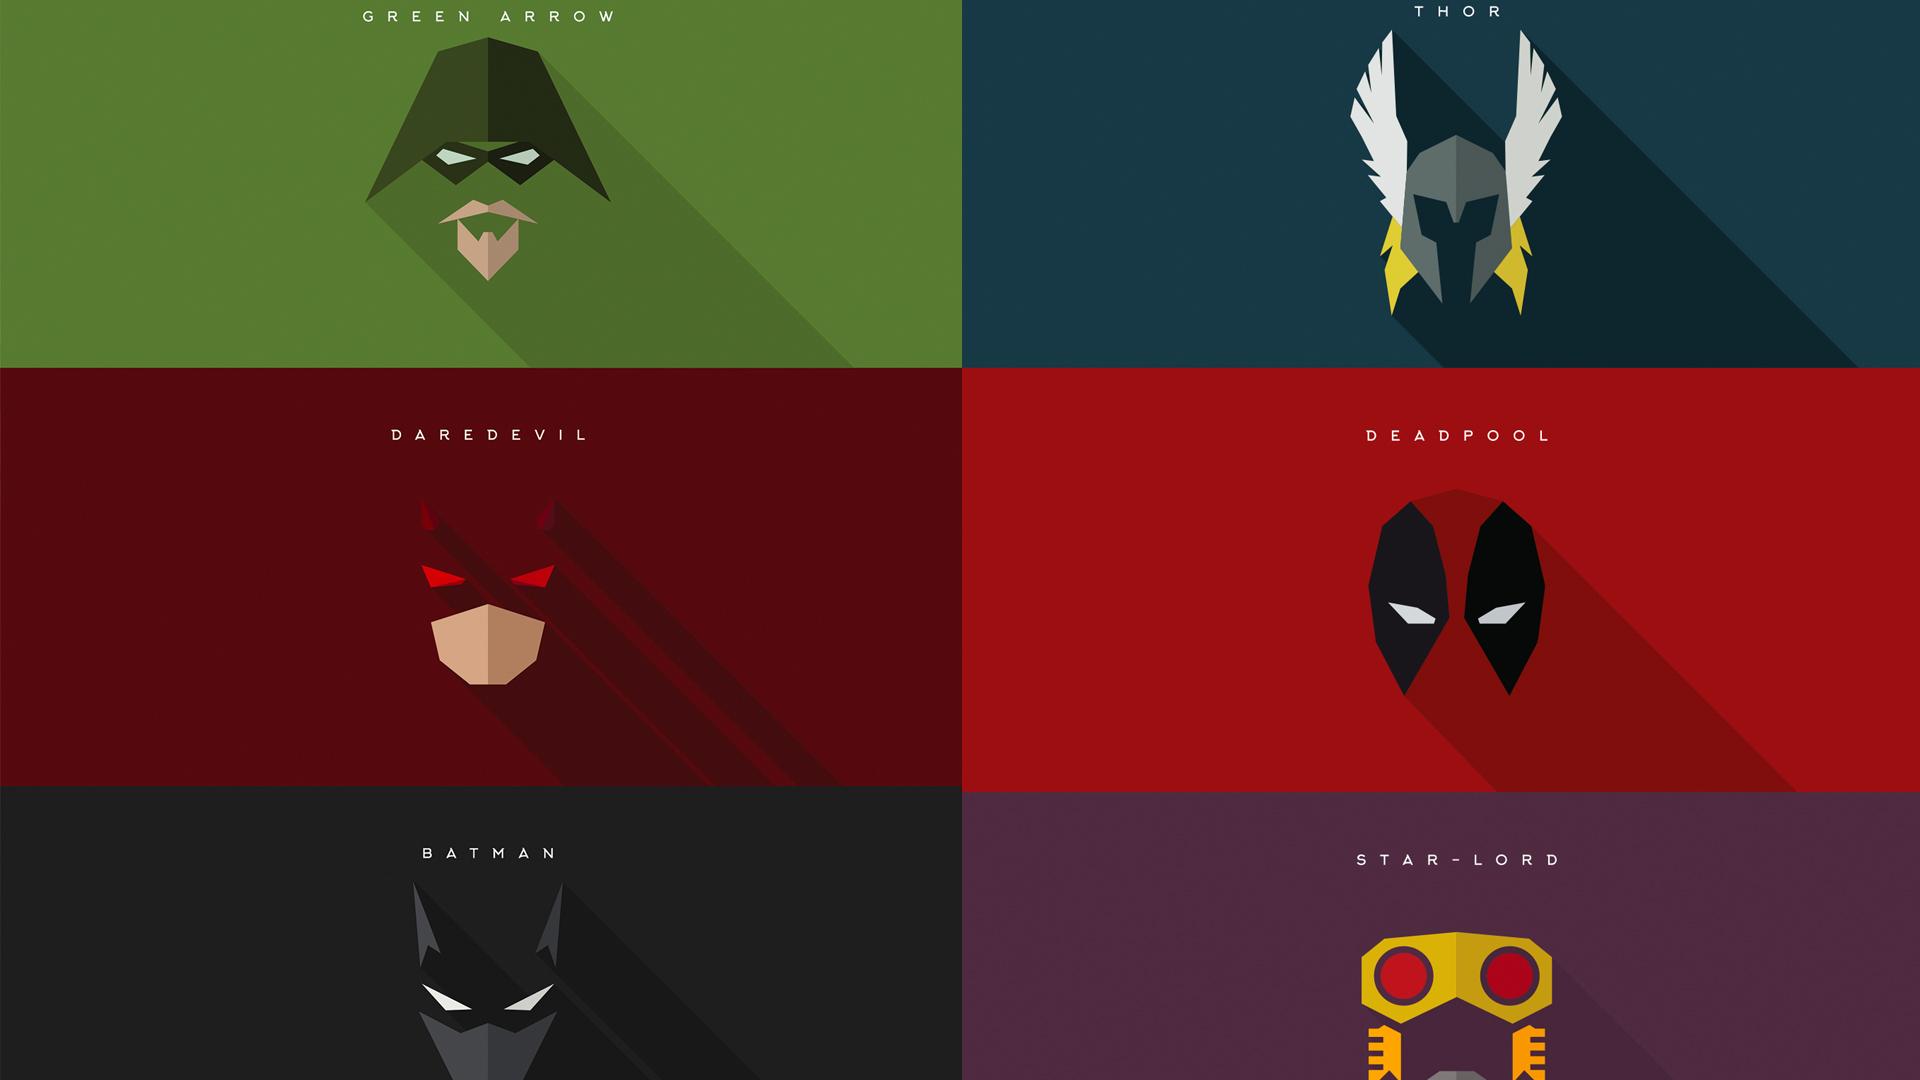 Minimalist Superhero Masks For Batman Daredevil Deadpool And More